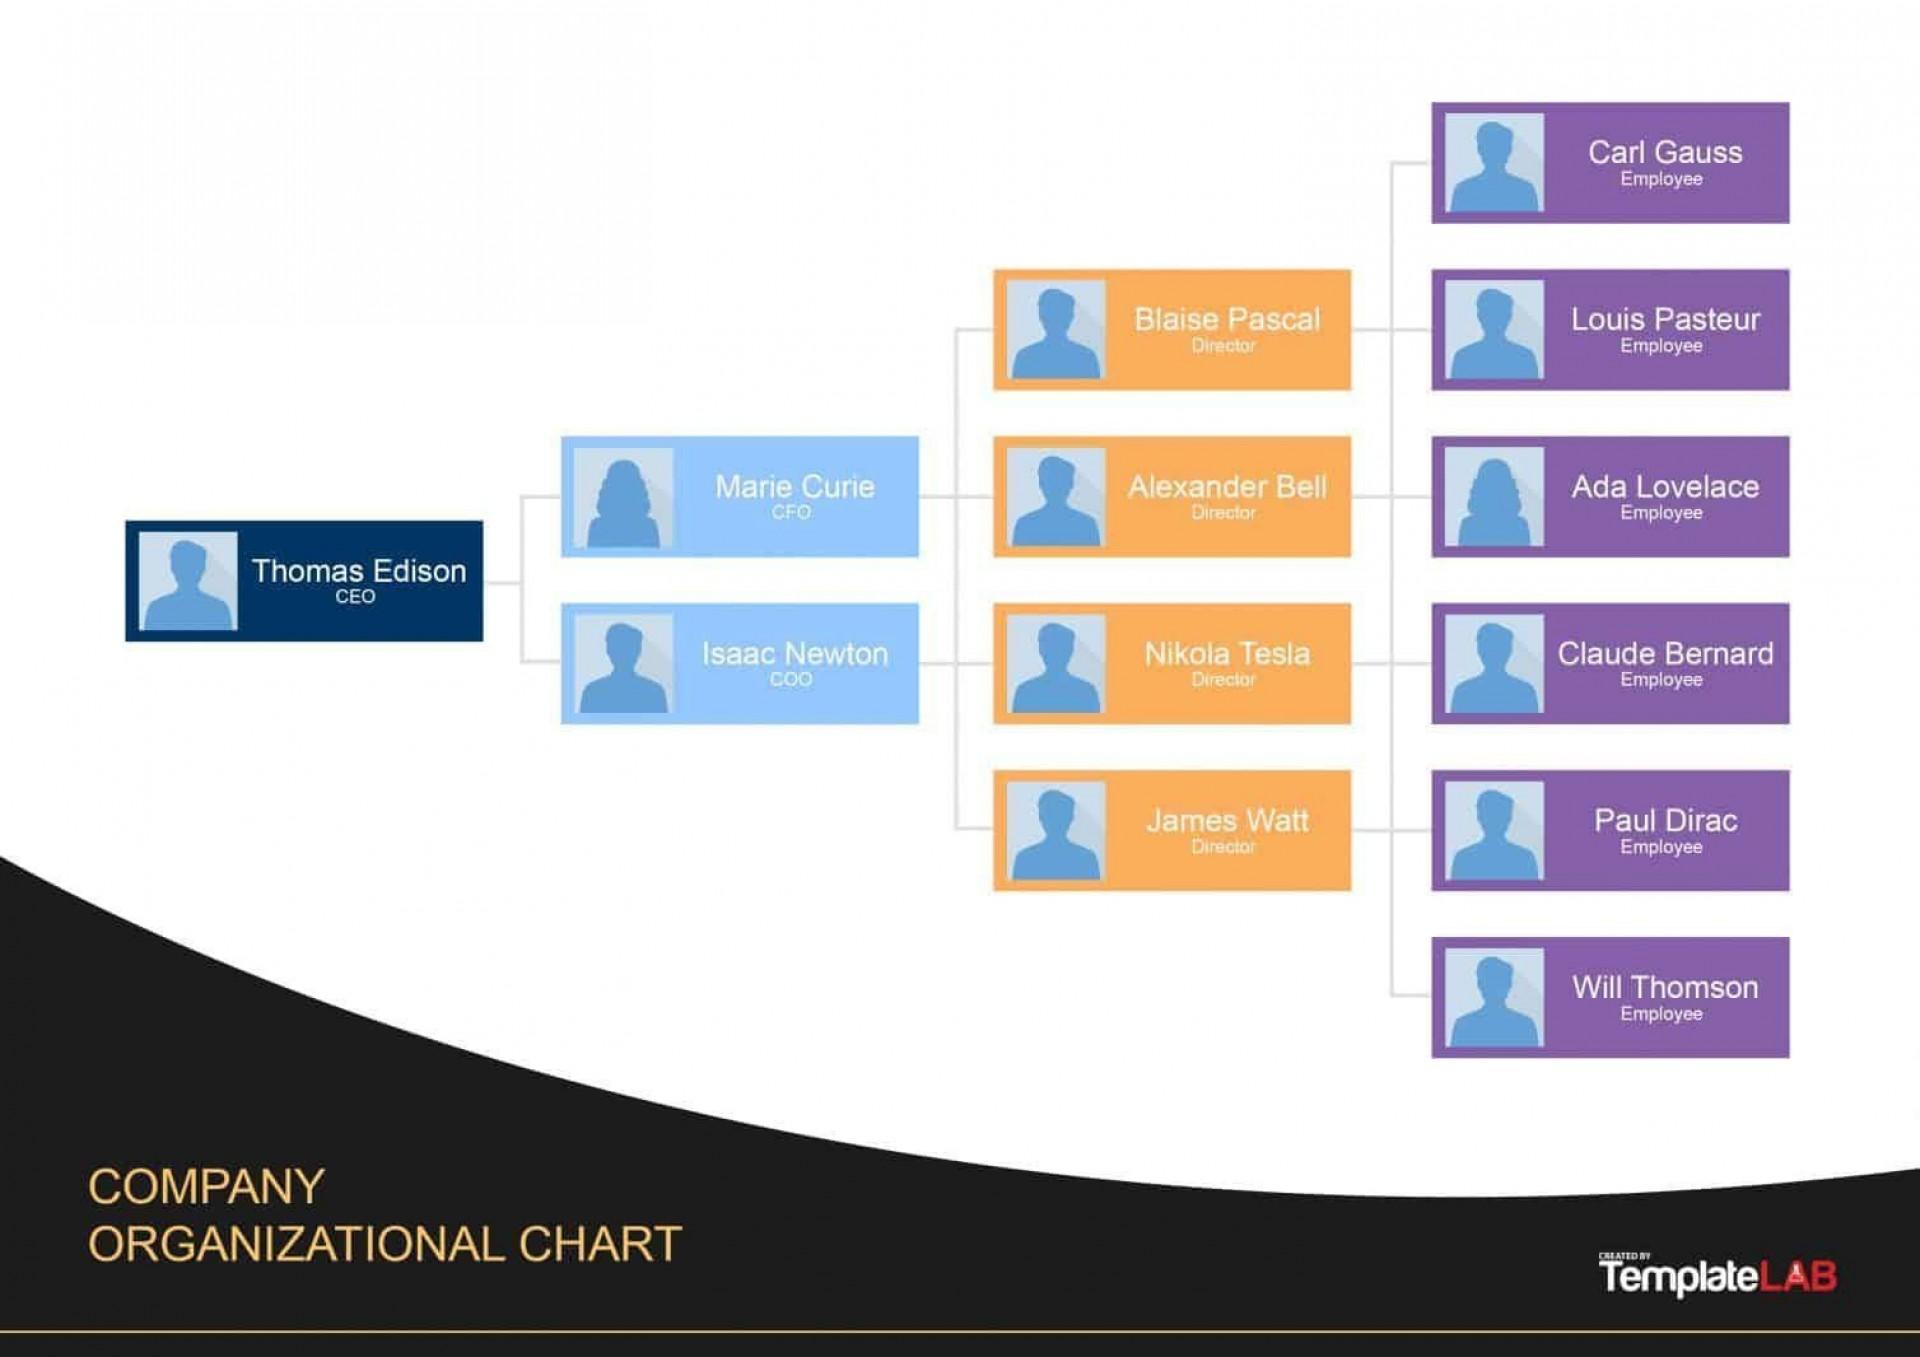 002 Imposing Word Org Chart Template Example  Free Organizational 2010 Microsoft1920